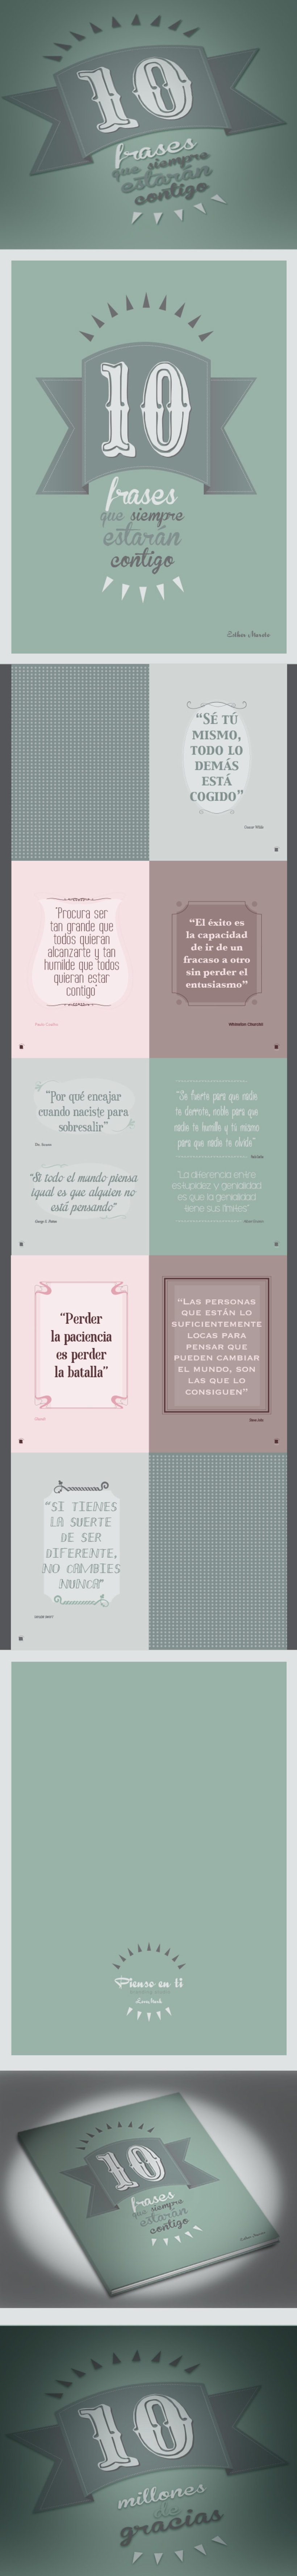 10 Quotes -1